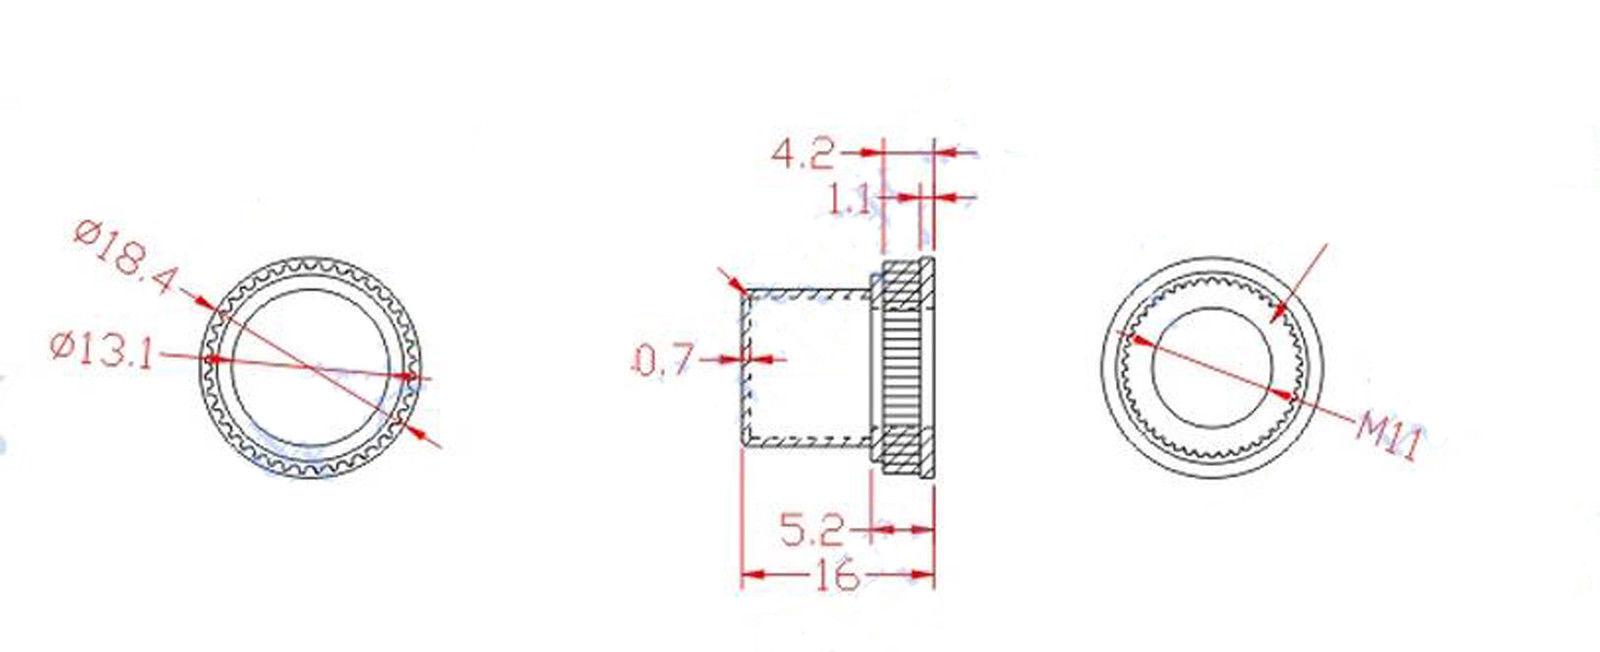 new easy read breaker box labels for circuit breakers ebay